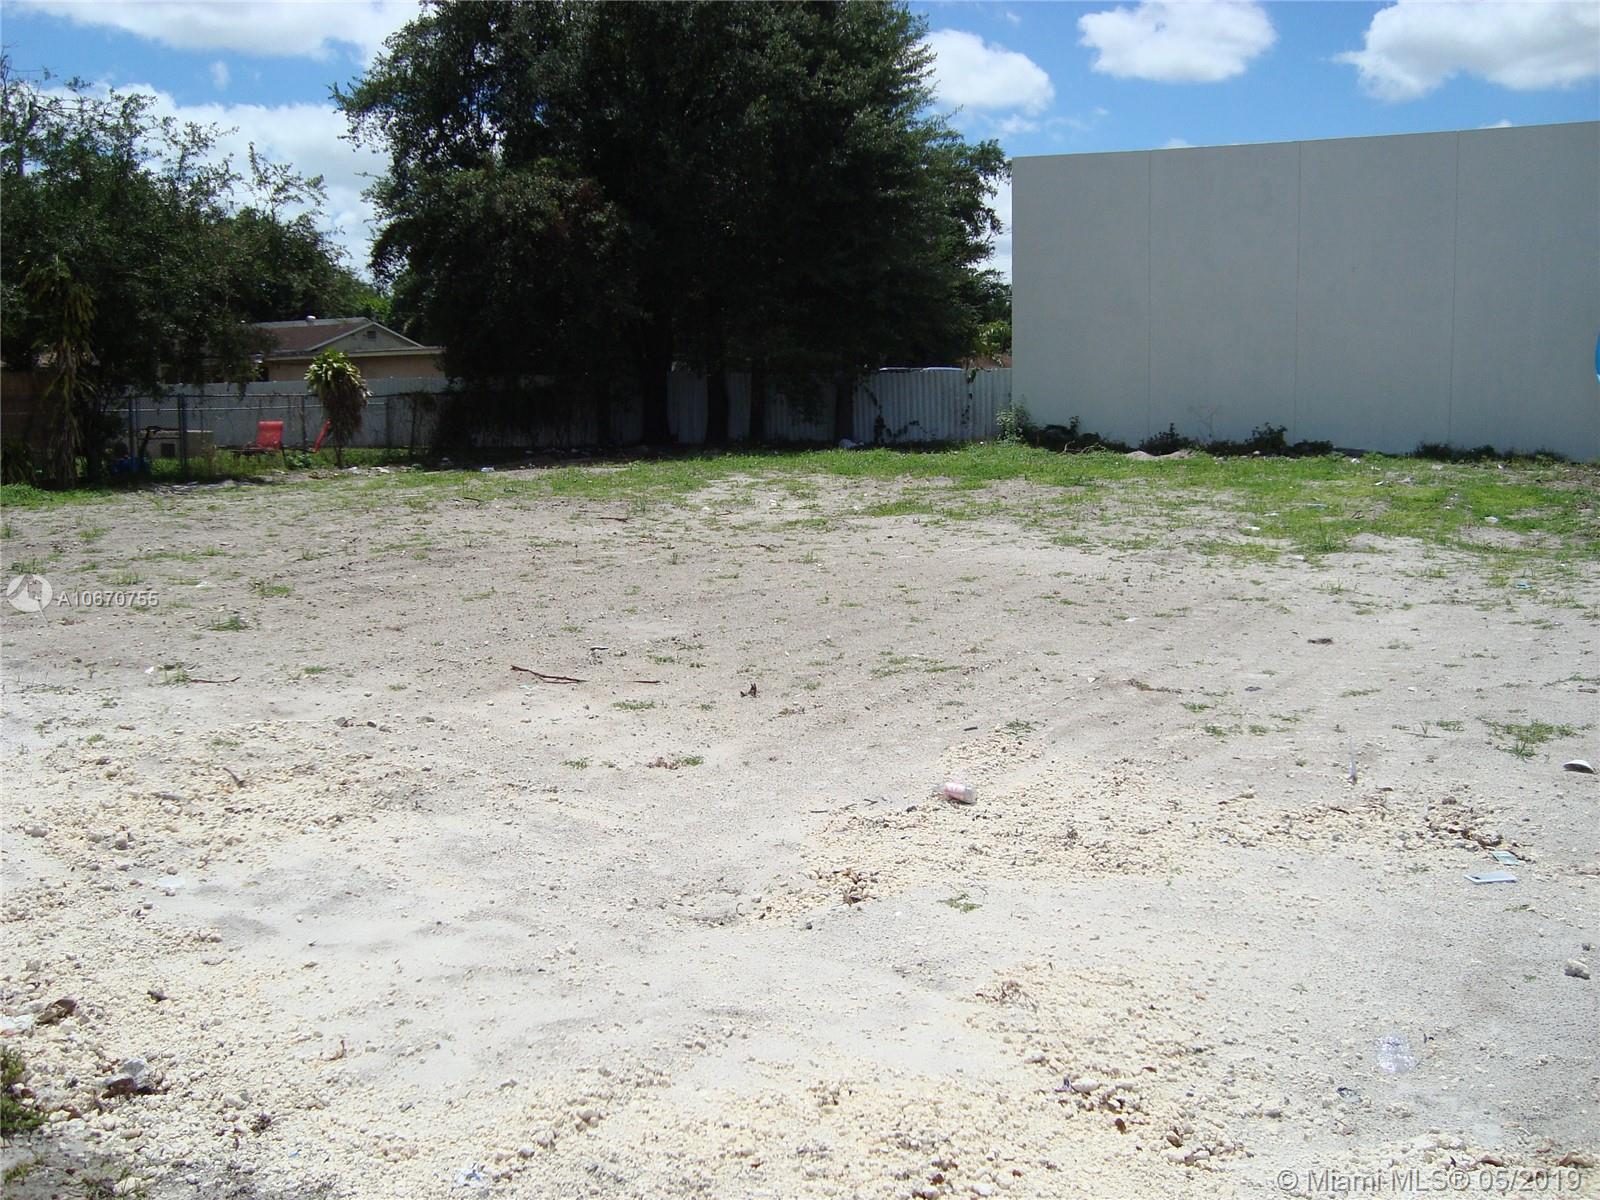 9229 Nw 22 Ave, Miami FL 33147 - Photo 1